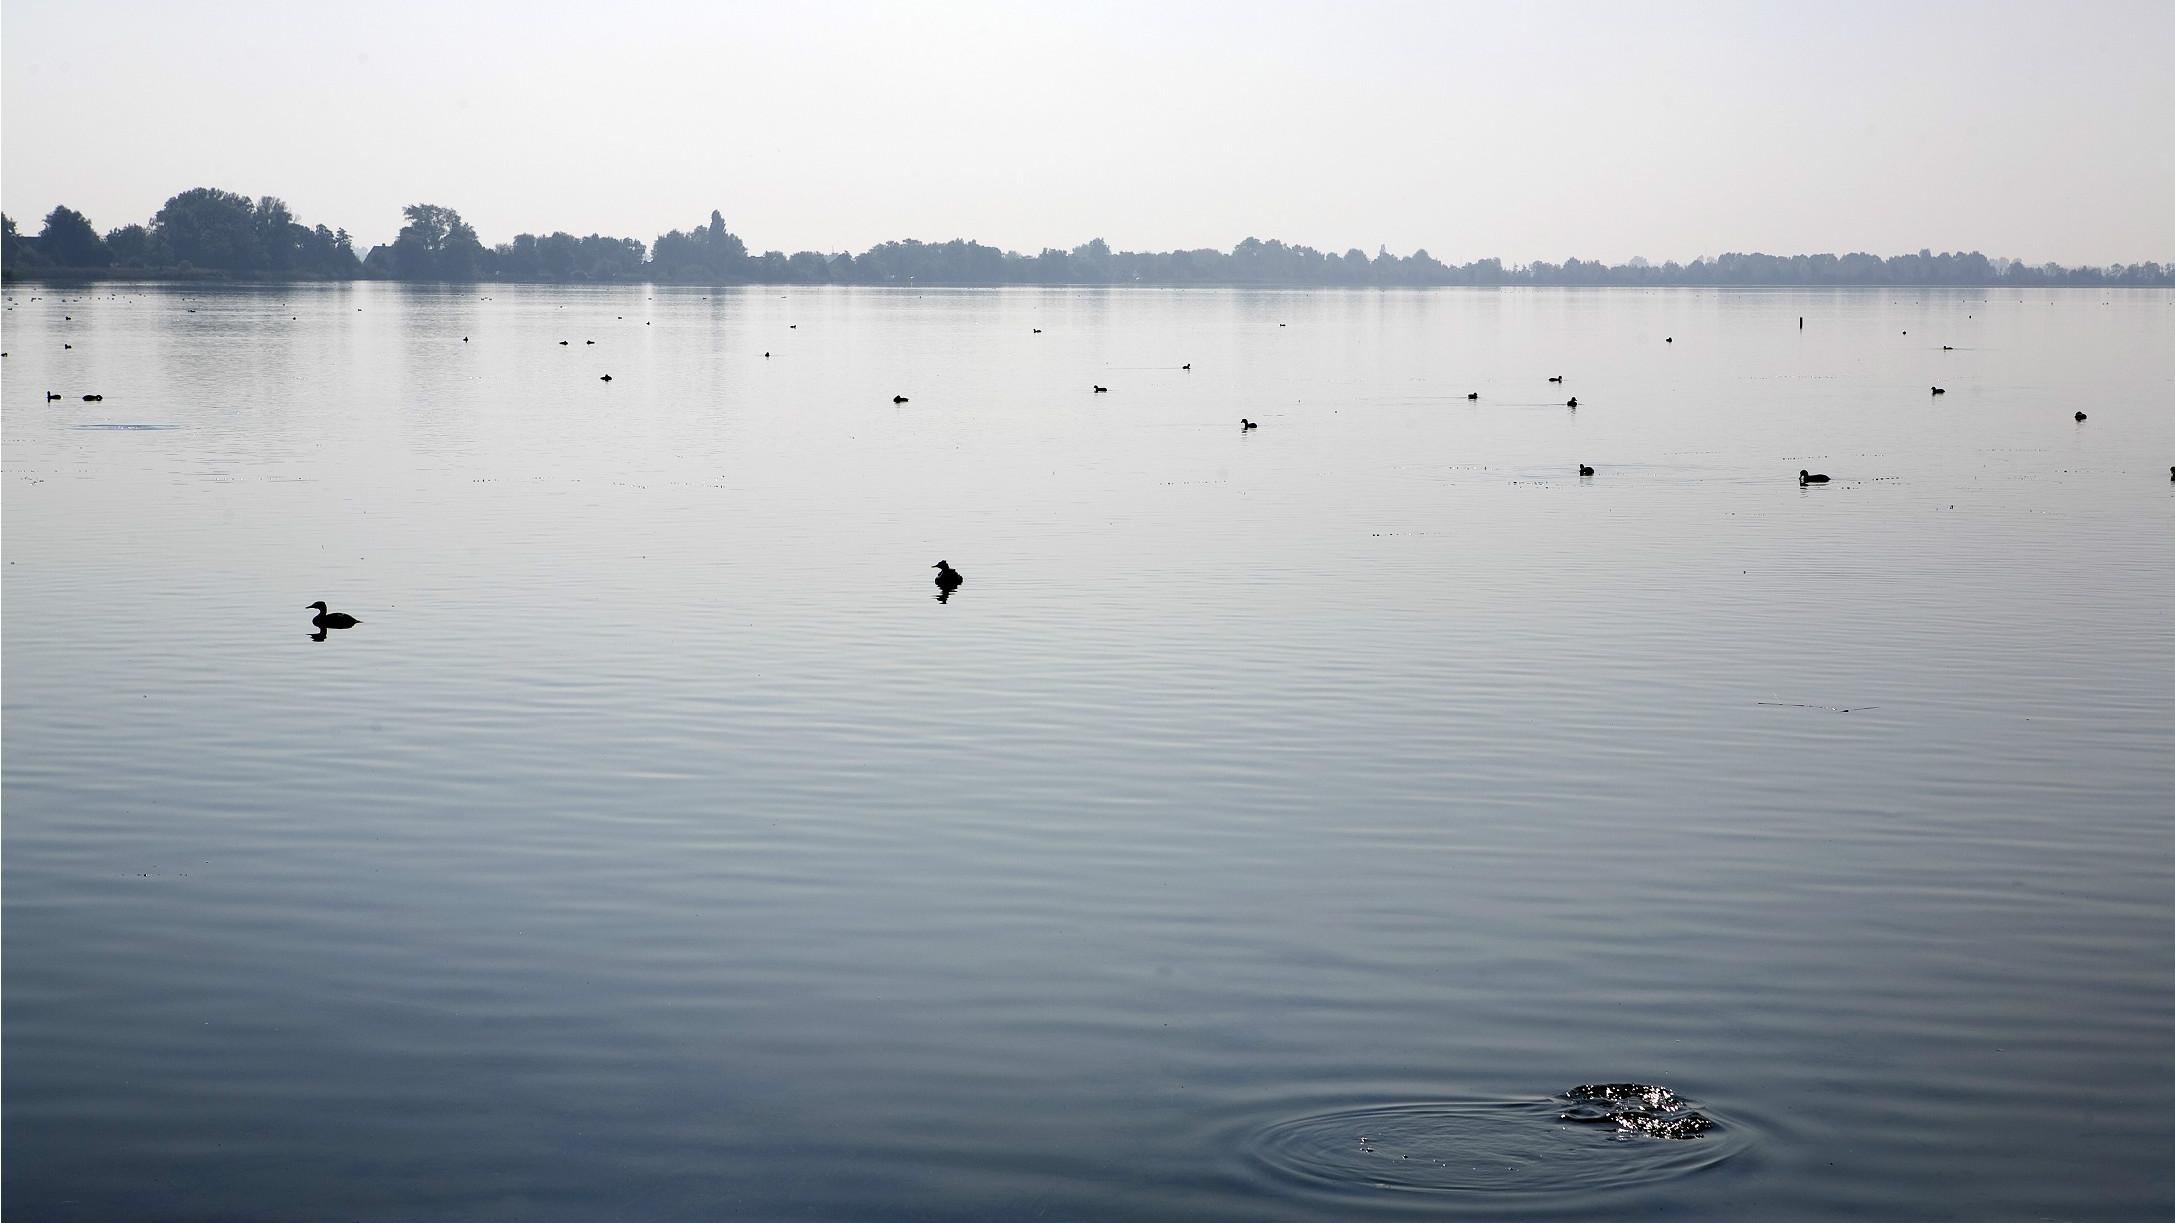 Bevuild oppervlaktewater bodem bezaaid met ongedierte foto van